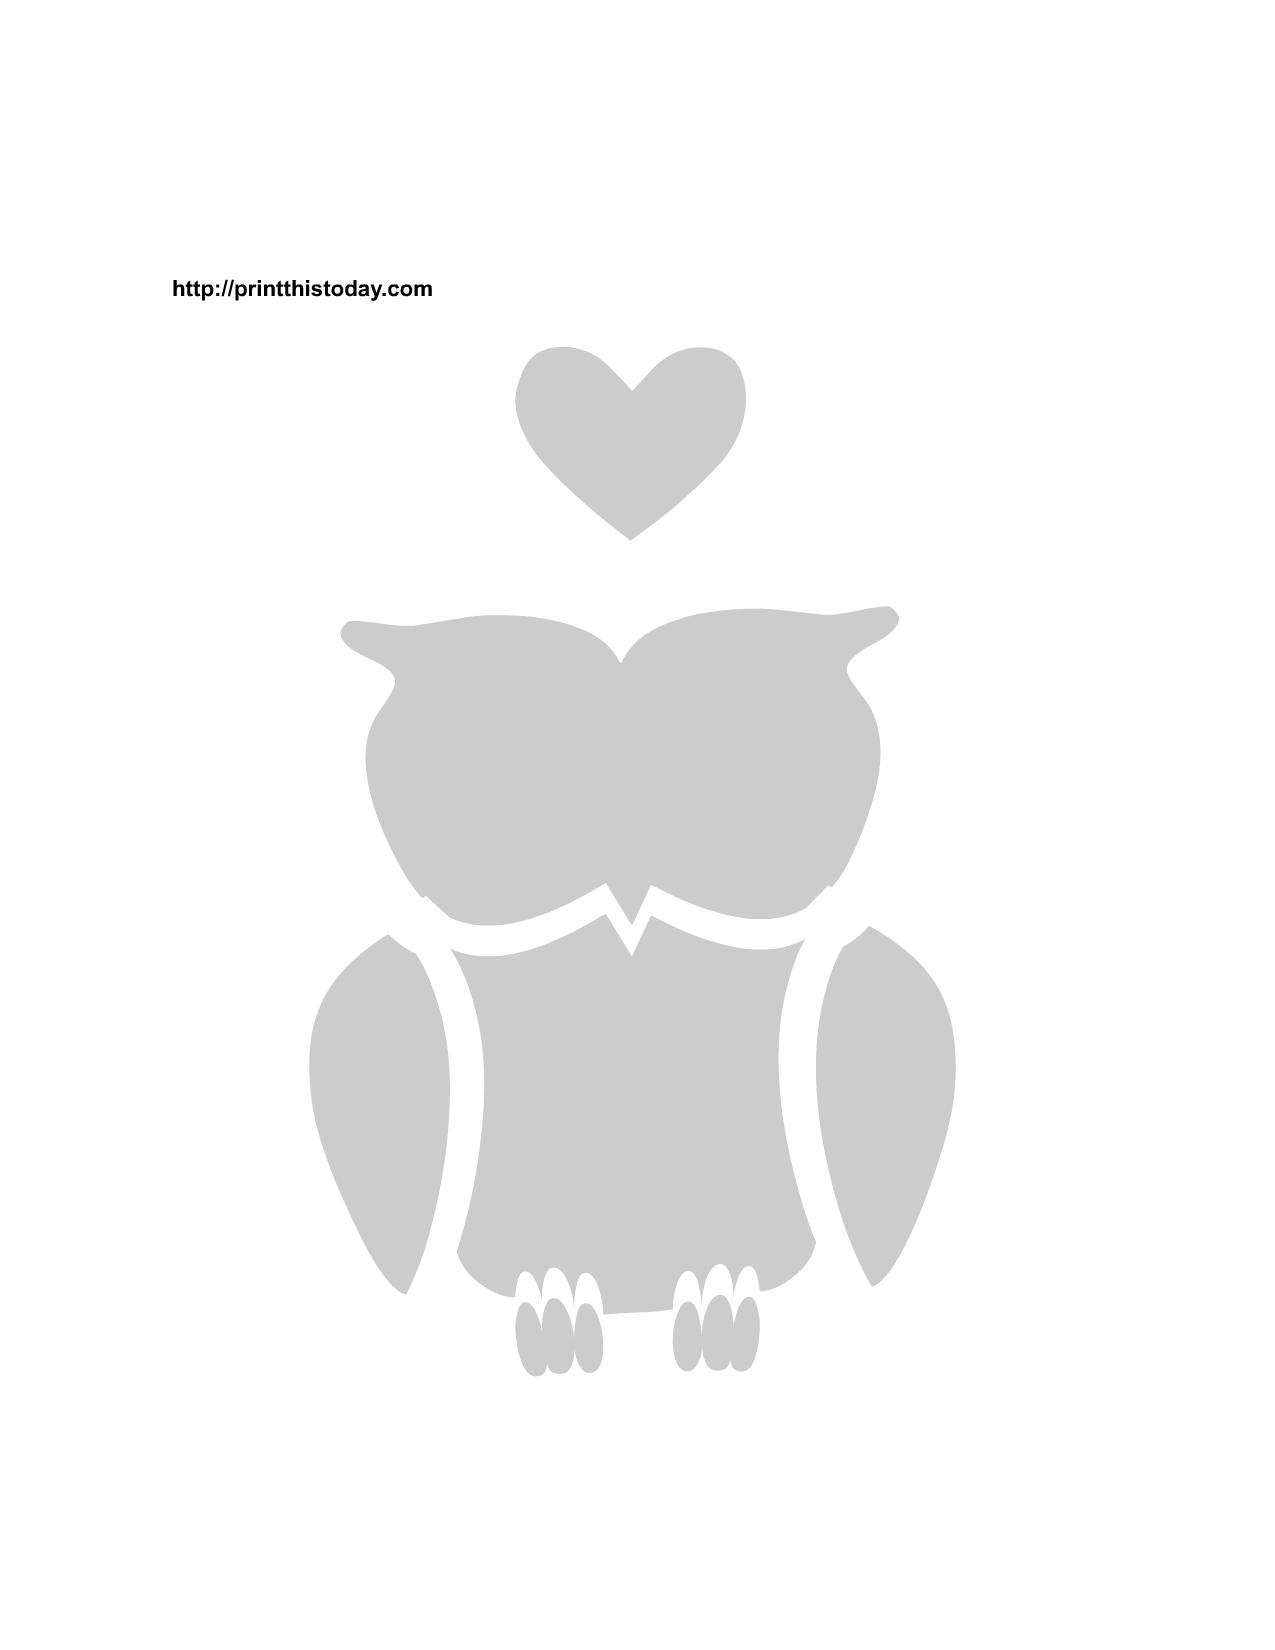 free printable love birds stencils